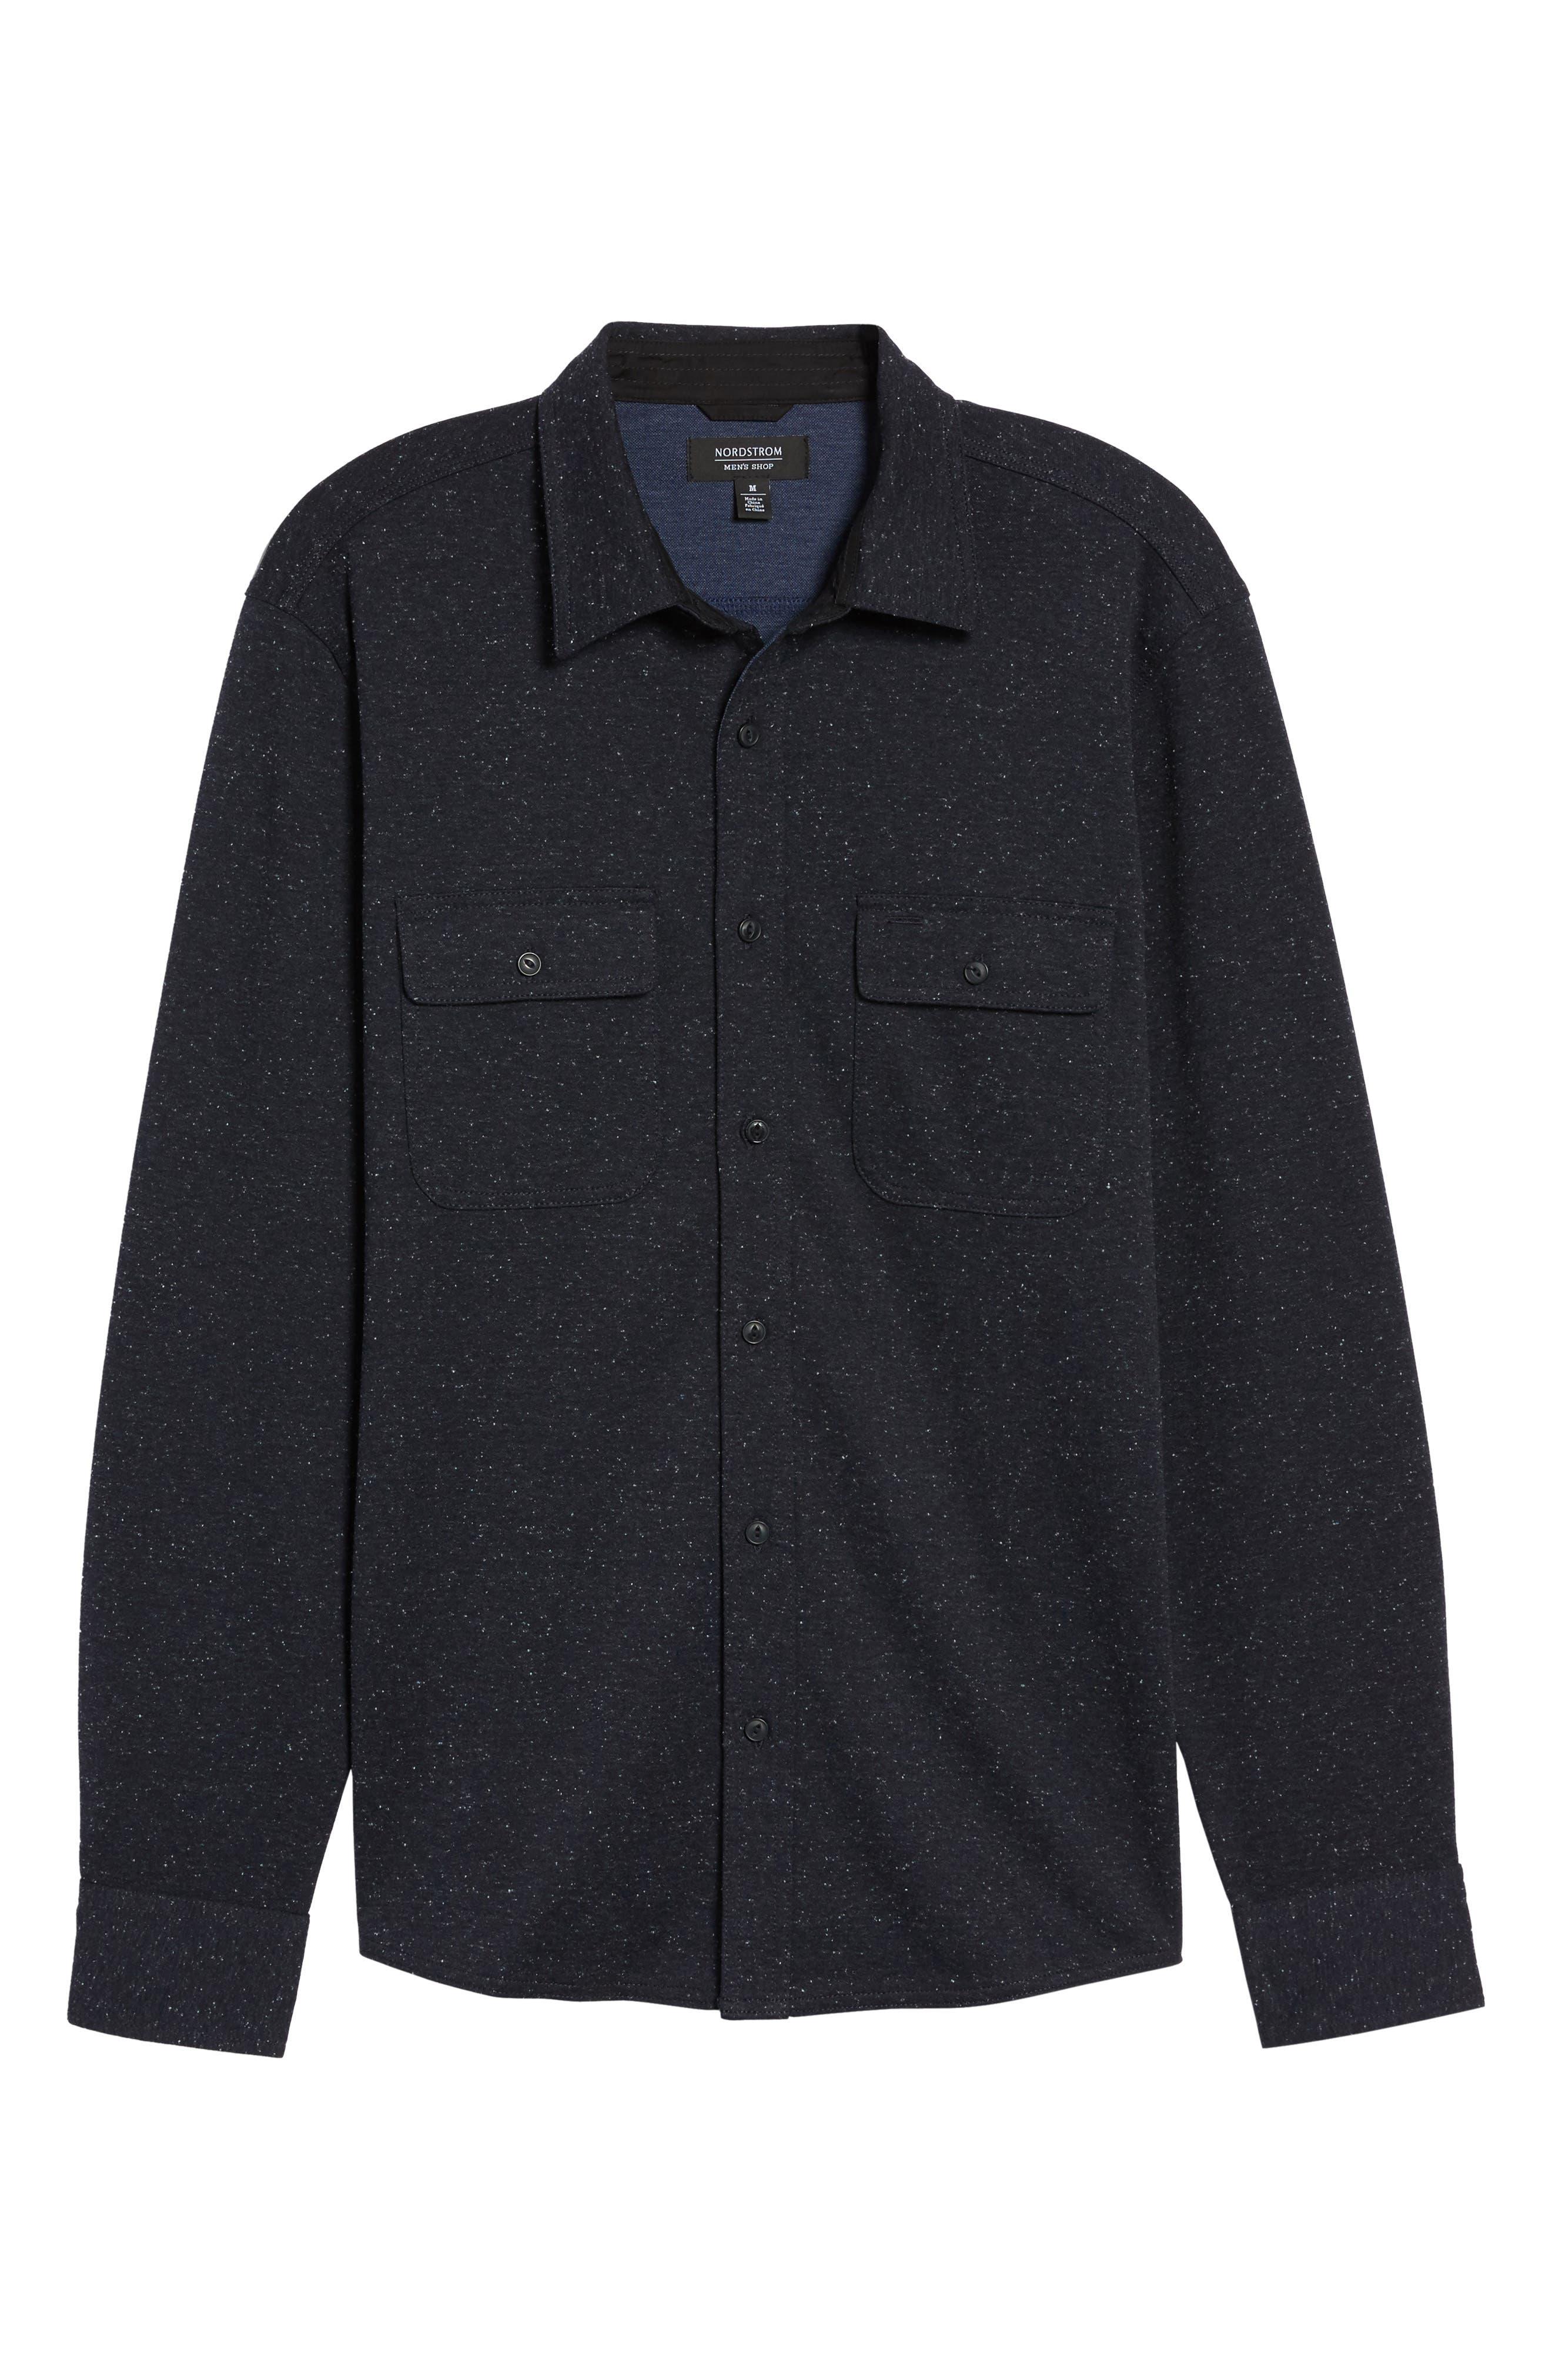 Knit Sport Shirt,                             Alternate thumbnail 6, color,                             Navy Iris Nep